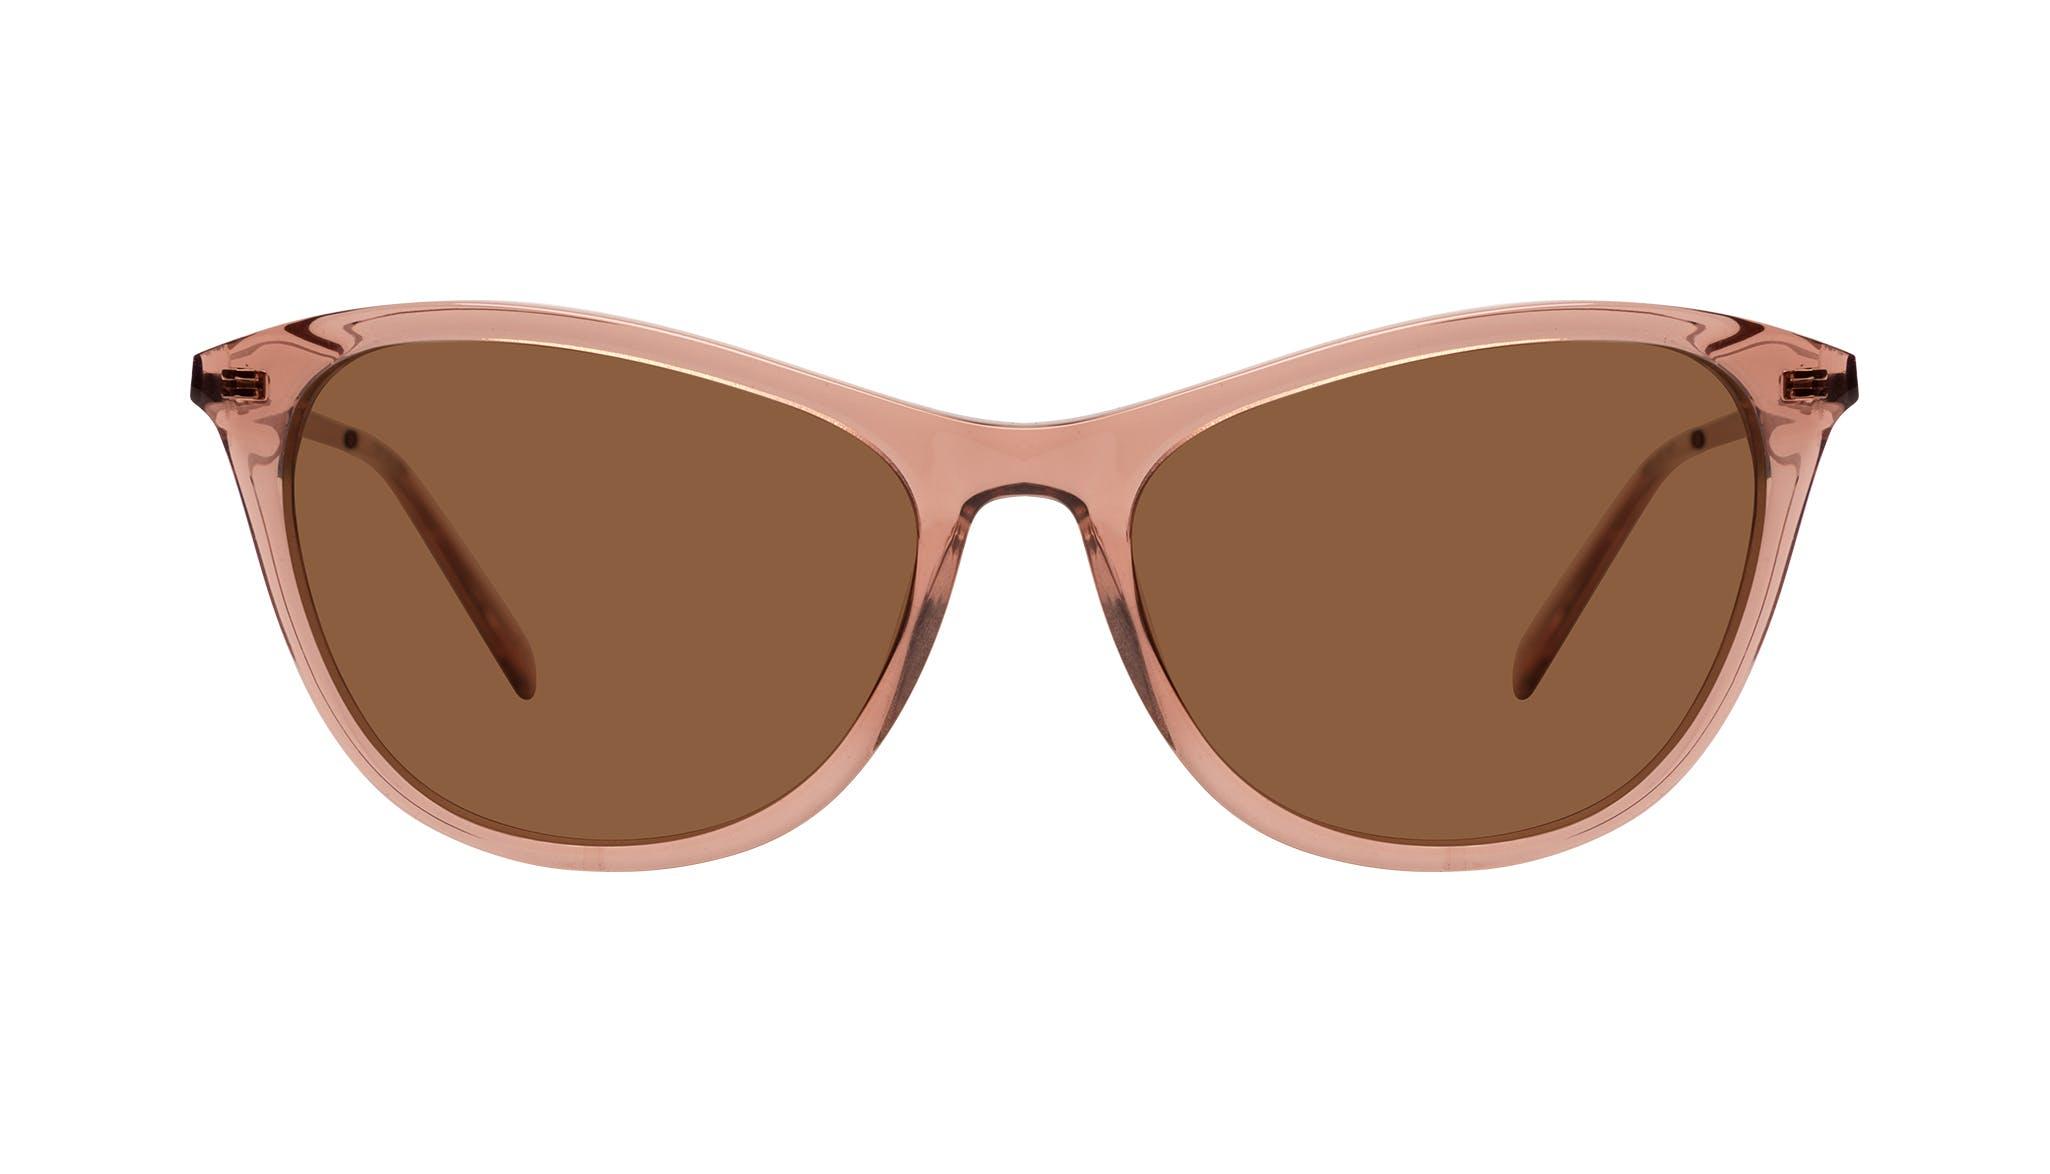 Affordable Fashion Glasses Cat Eye Sunglasses Women Folk Plus Rose